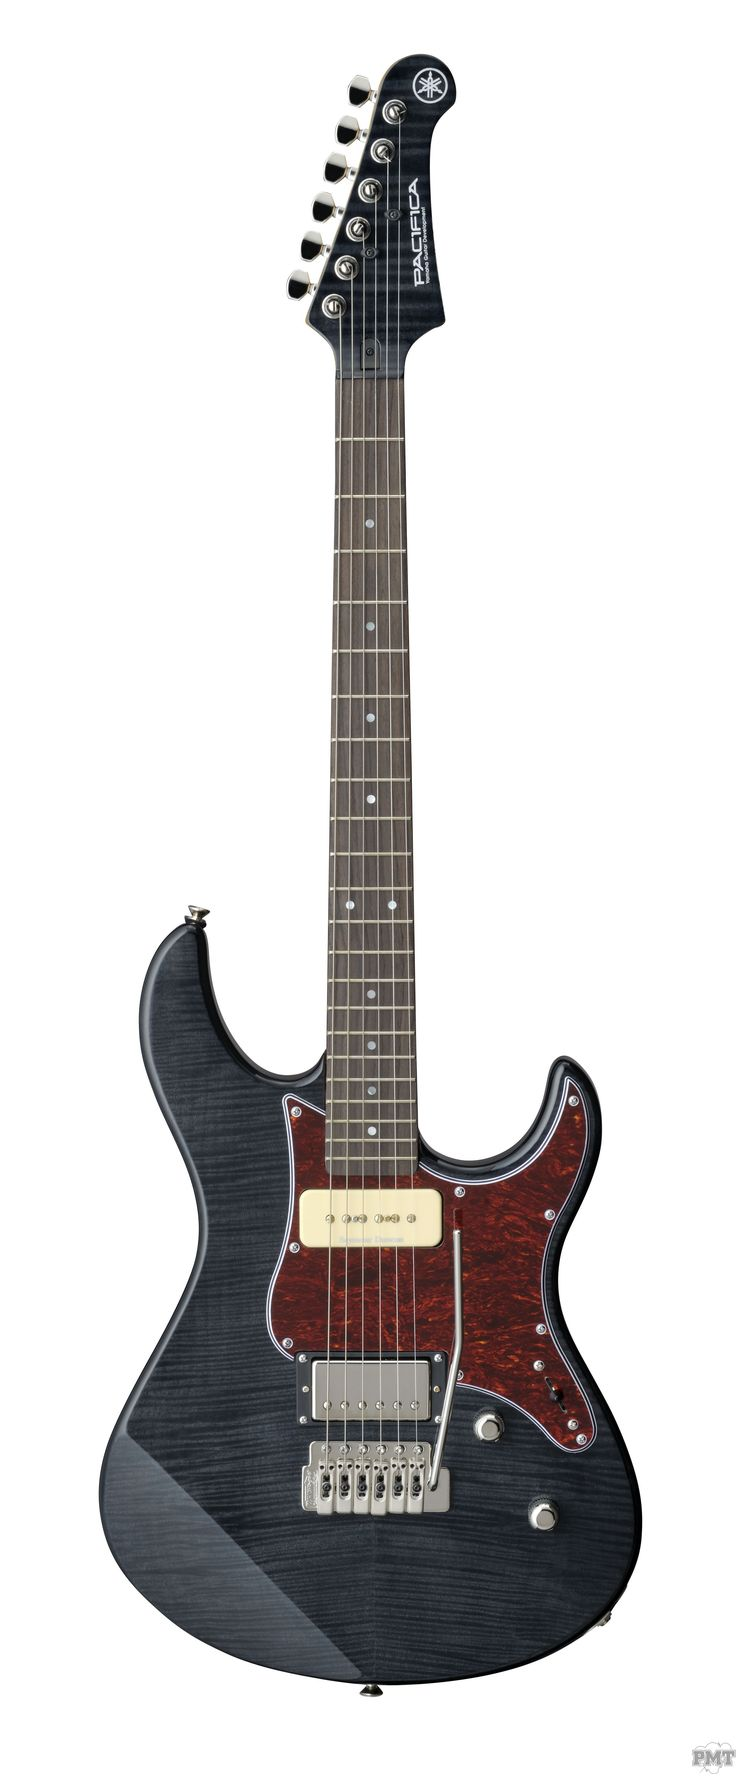 Yamaha Pacifica 611 VFM Electric Guitar in Translucent Black